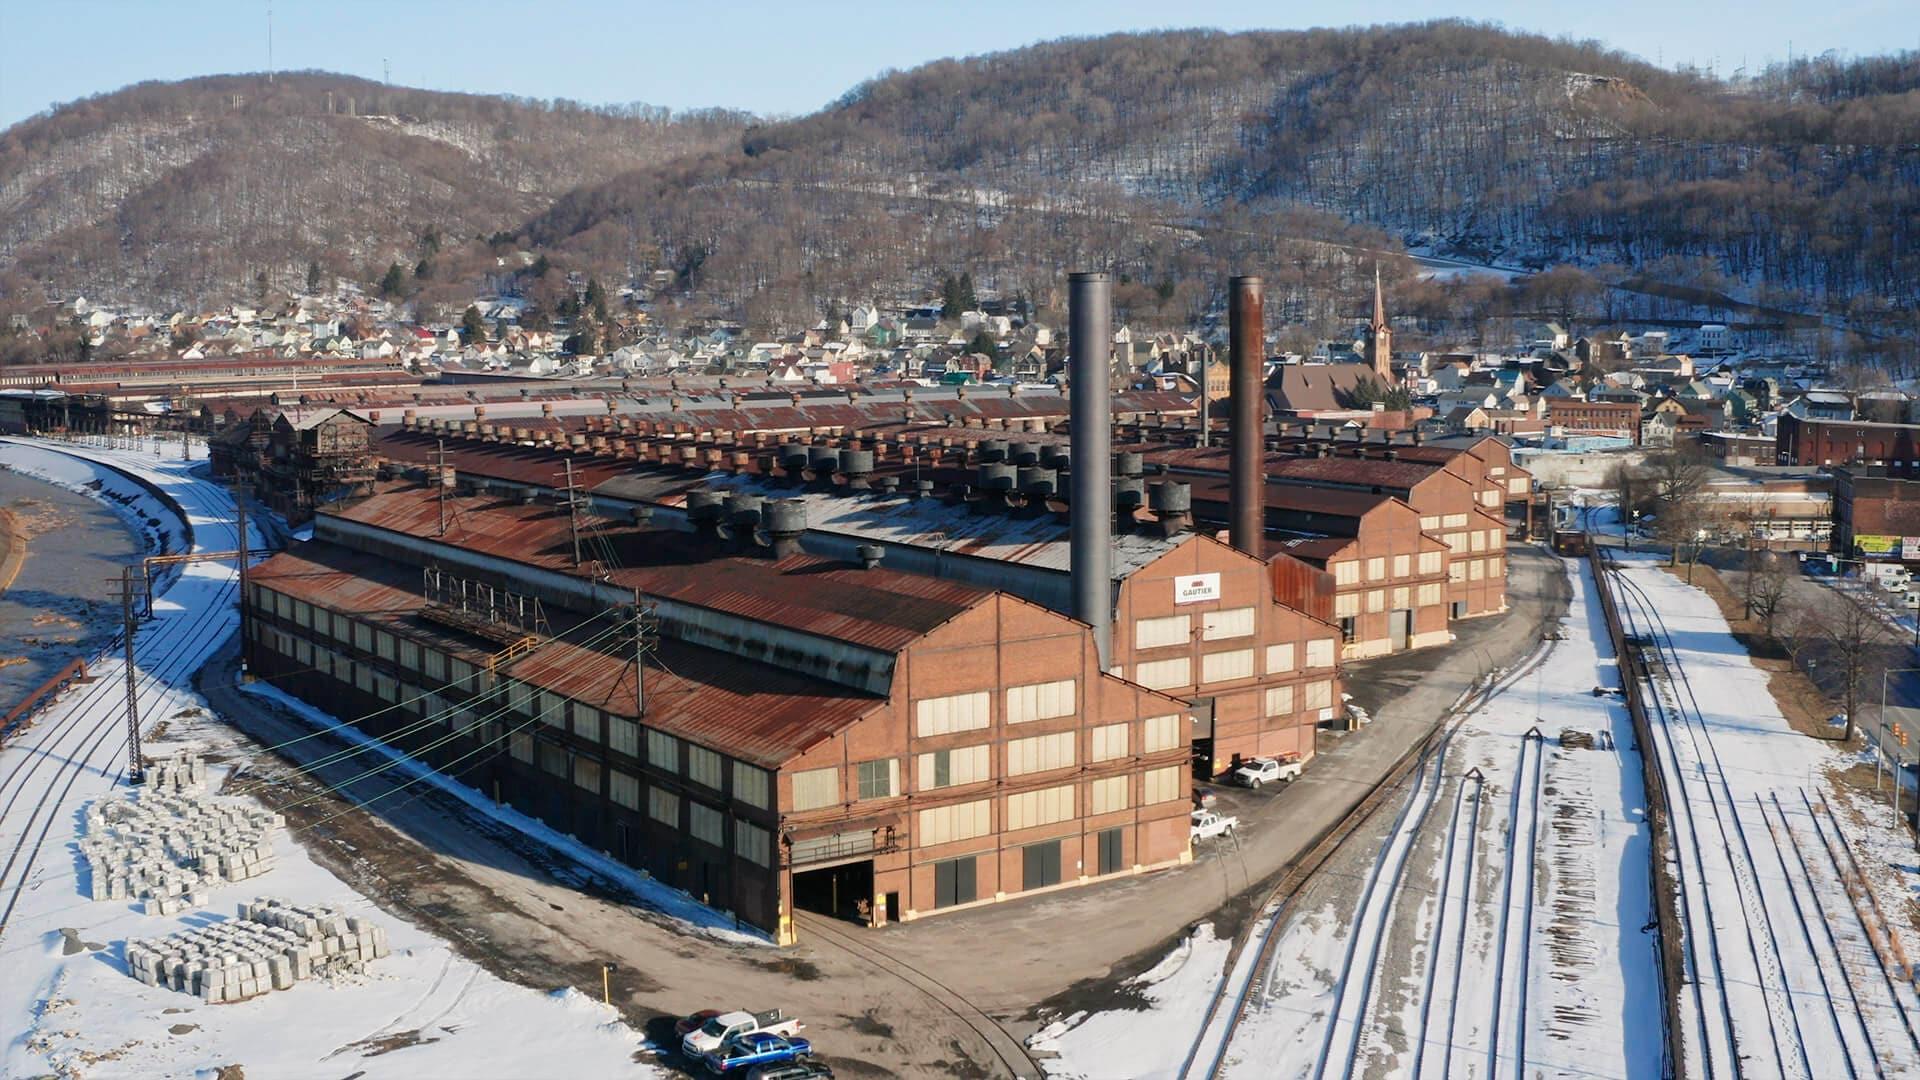 Rows of factory buildings